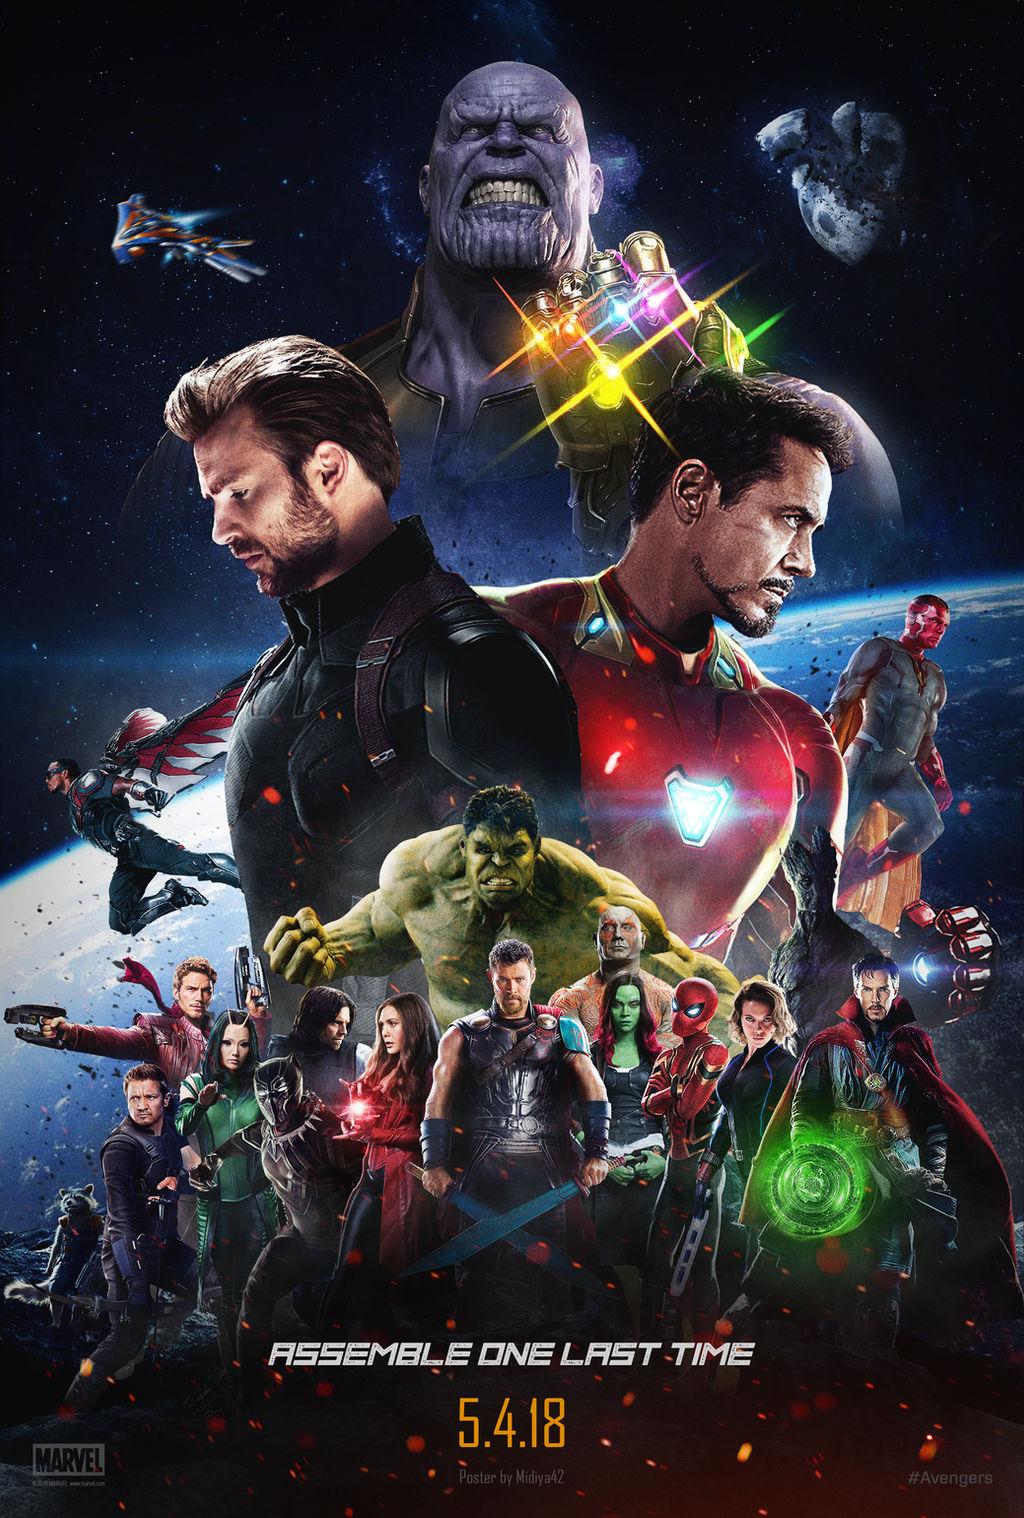 Avengers Infinity War 2018 Poster By Midiya42 On Deviantart